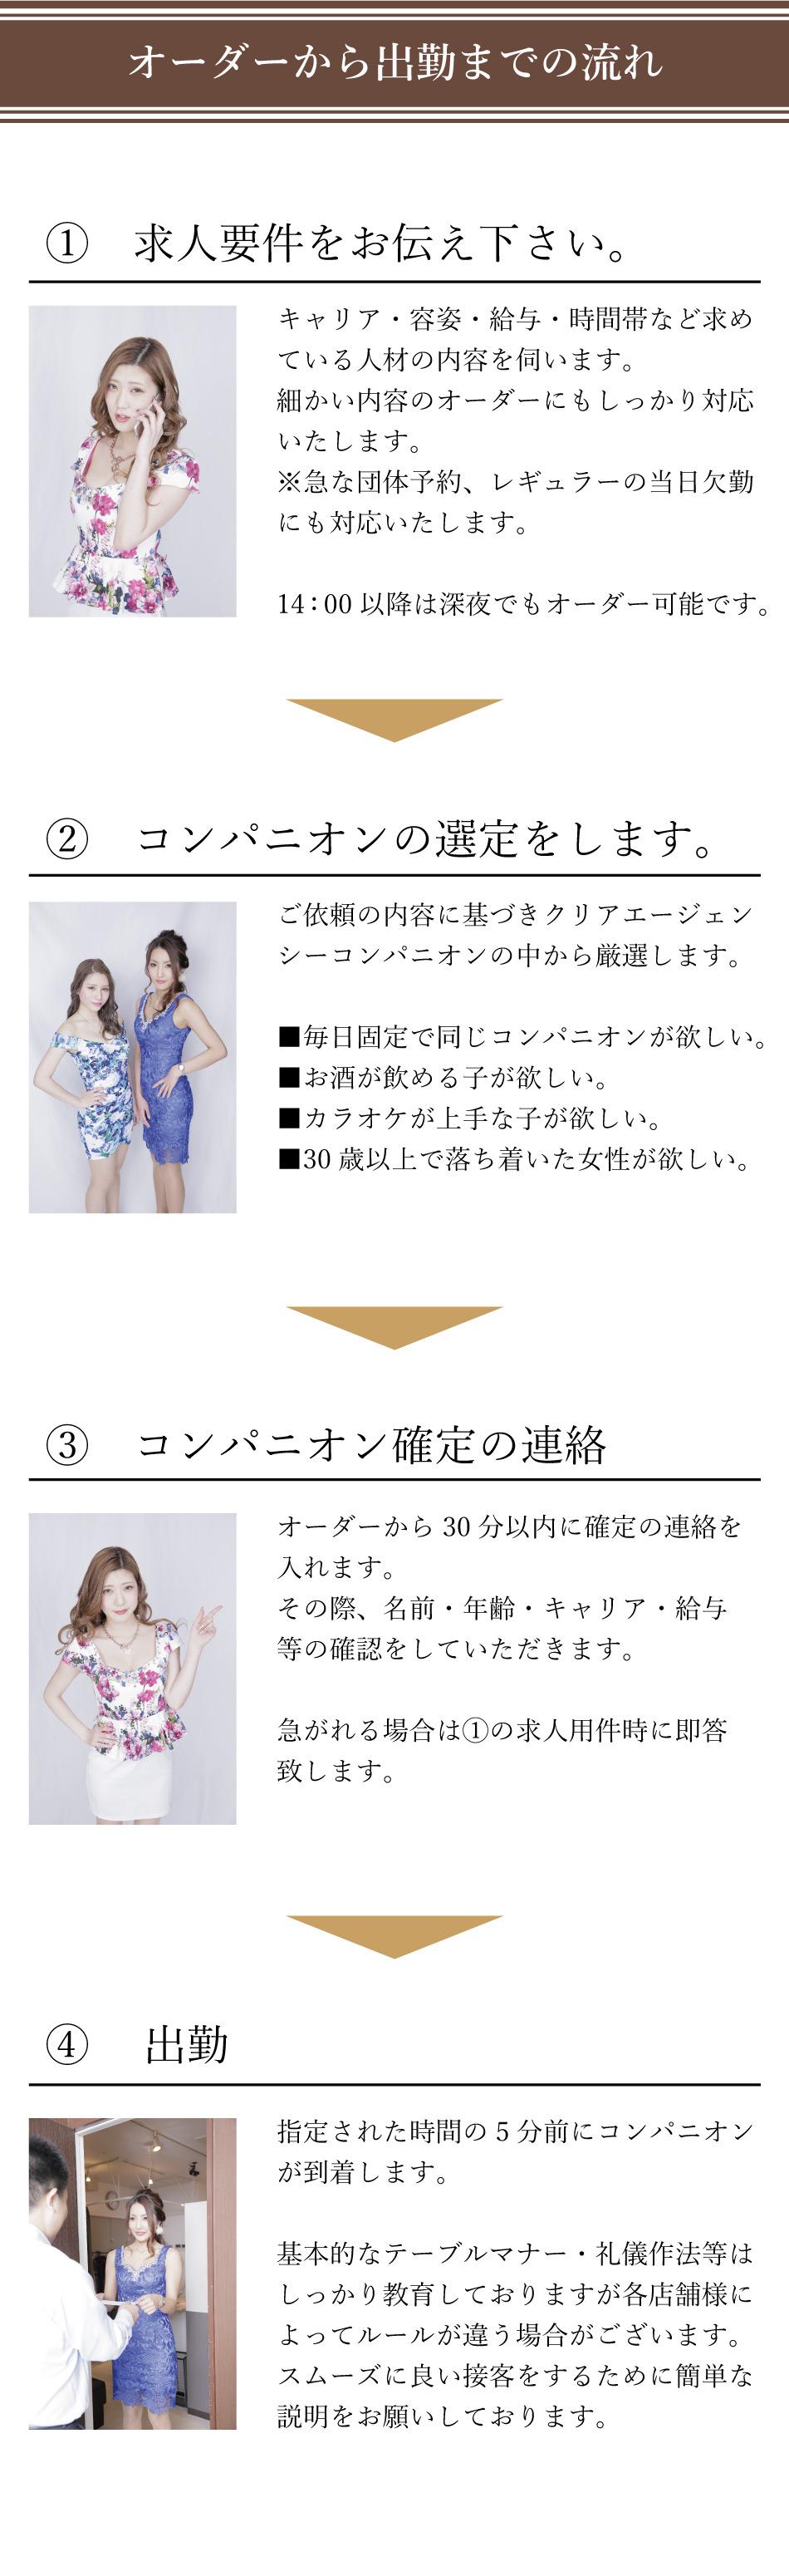 order-4